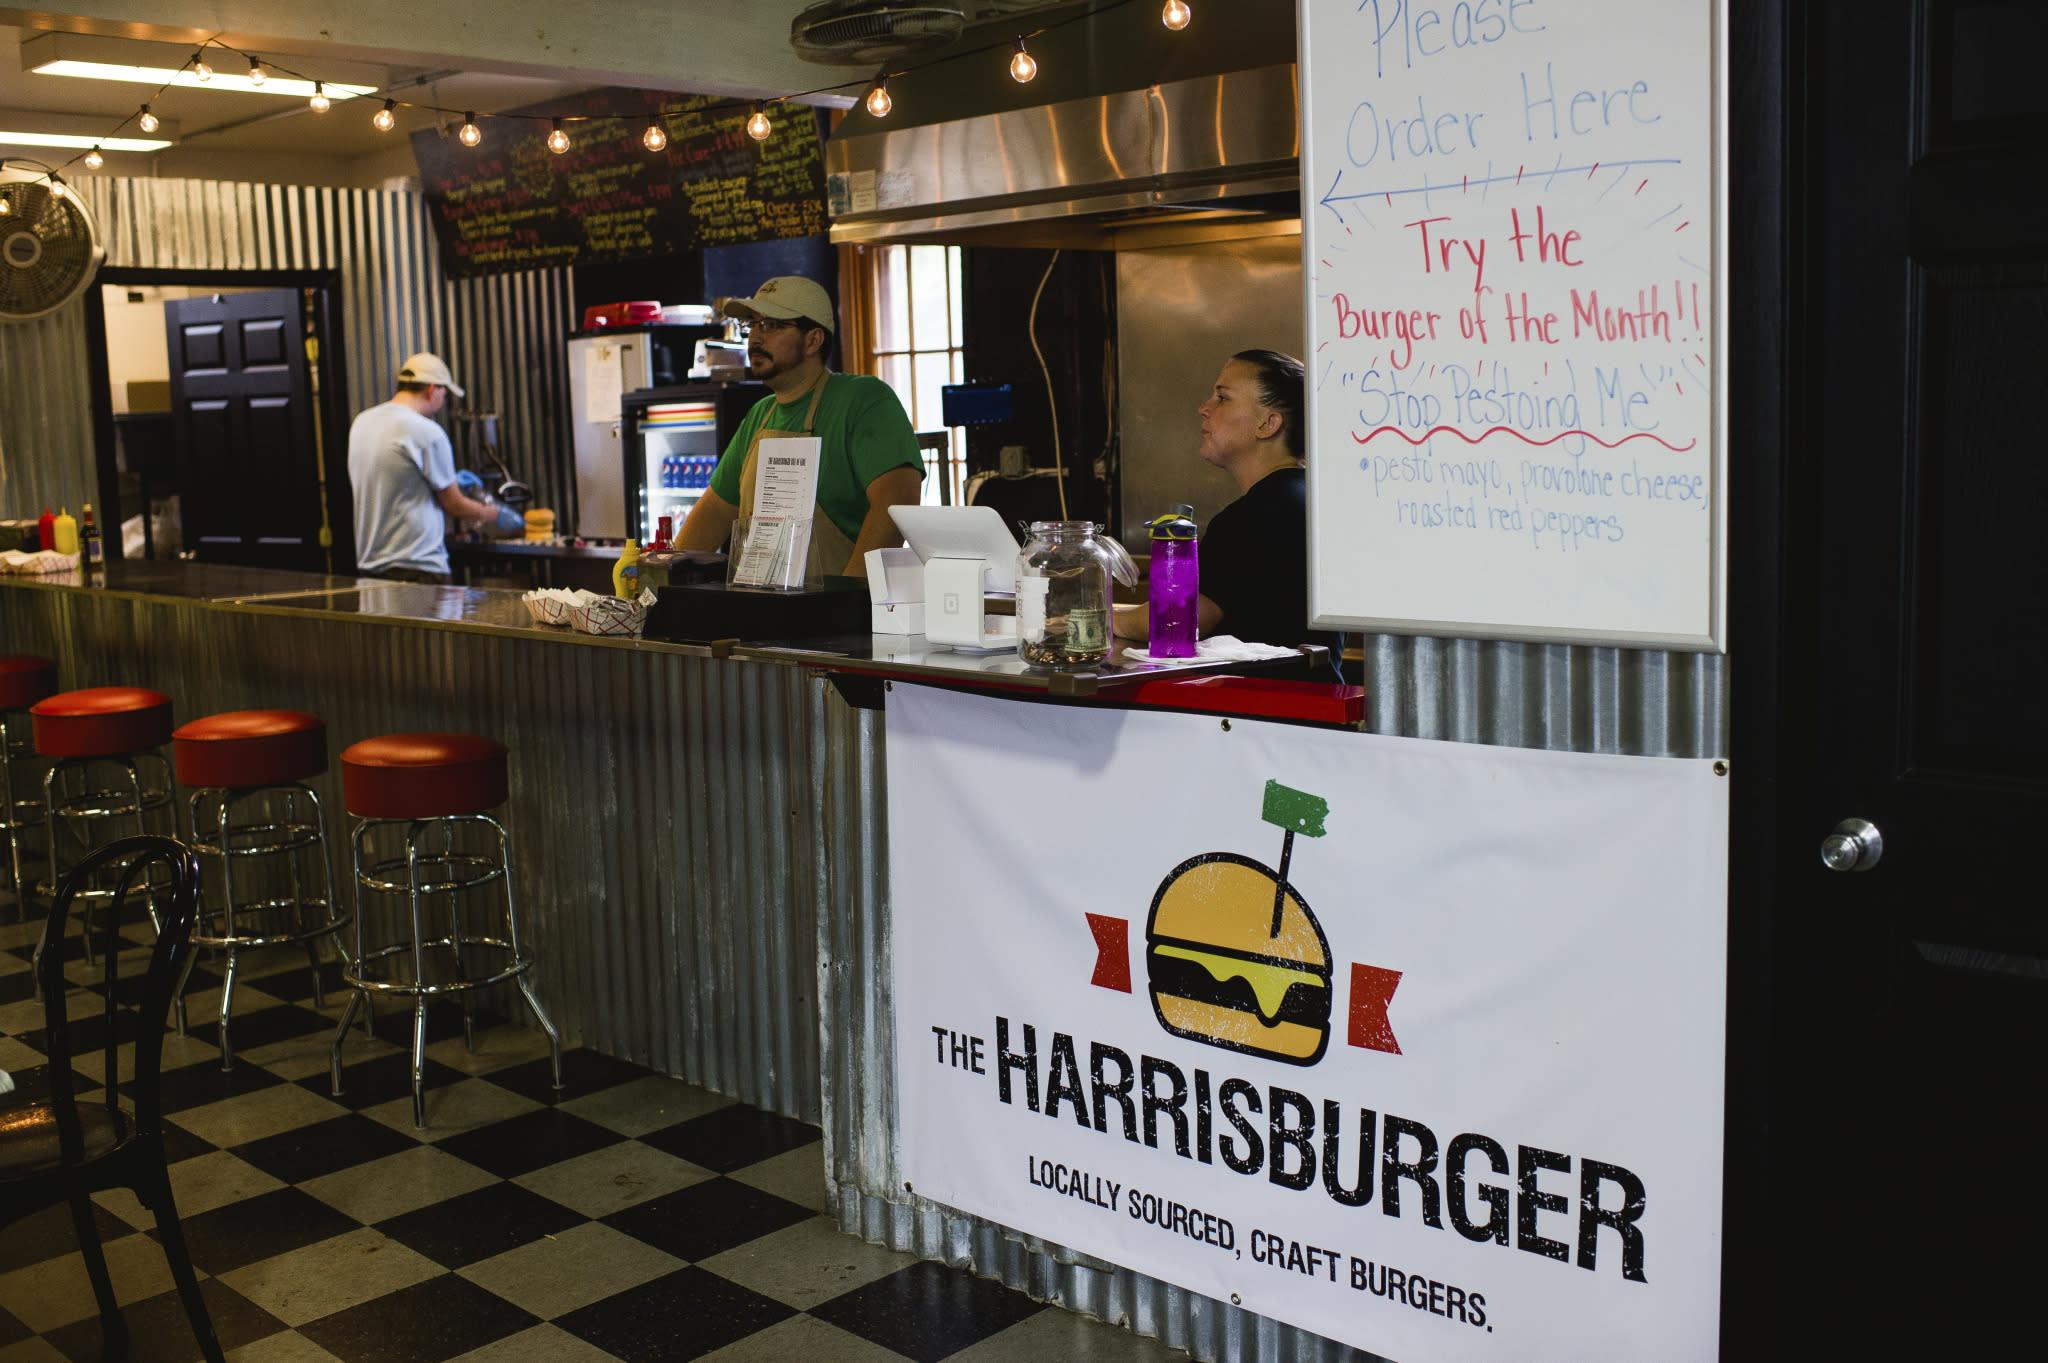 Harrisburger